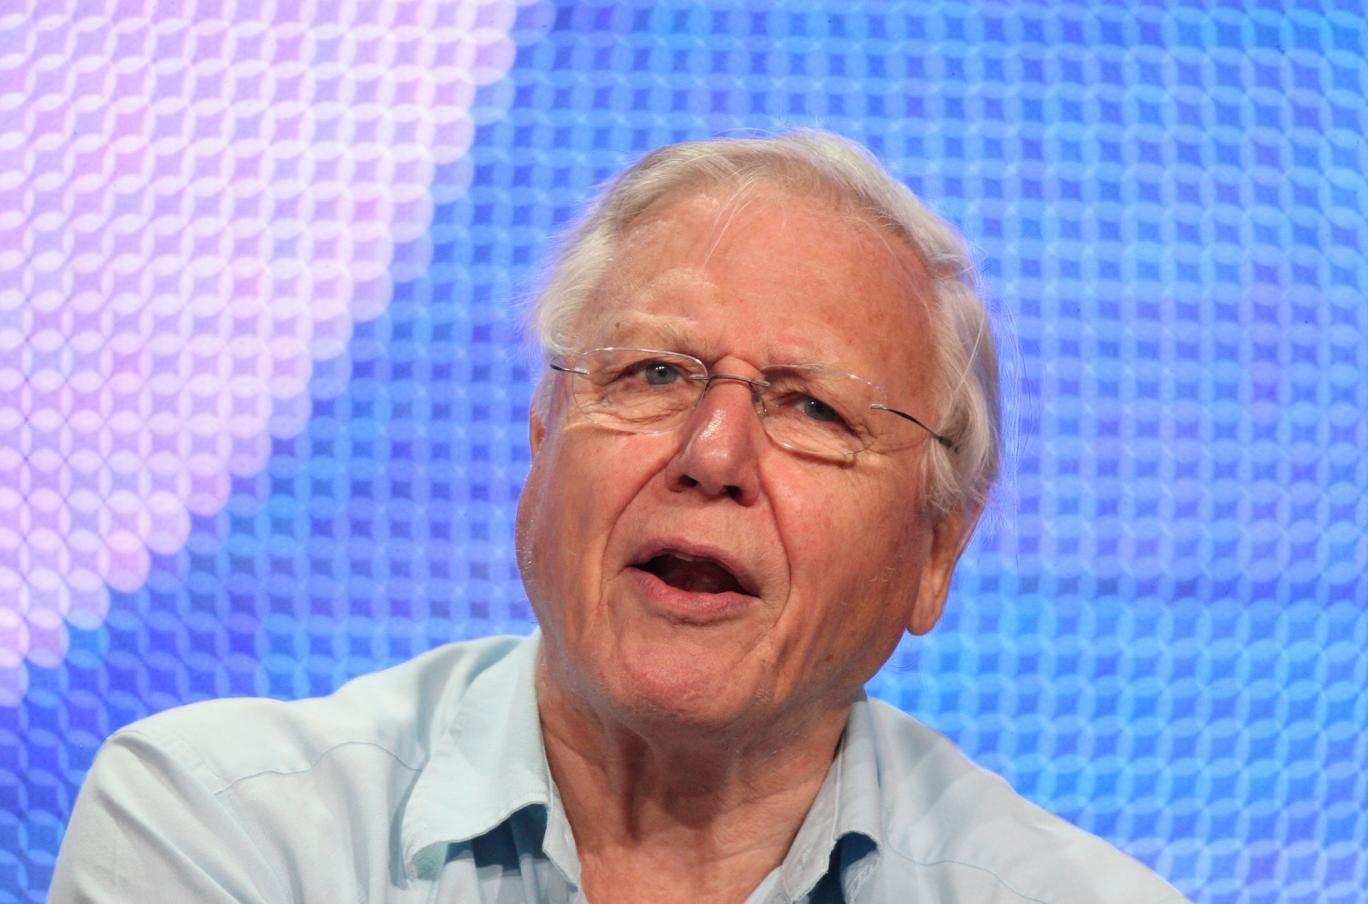 Sir David Attenborough is to present Tweet Of The Day on Radio 4